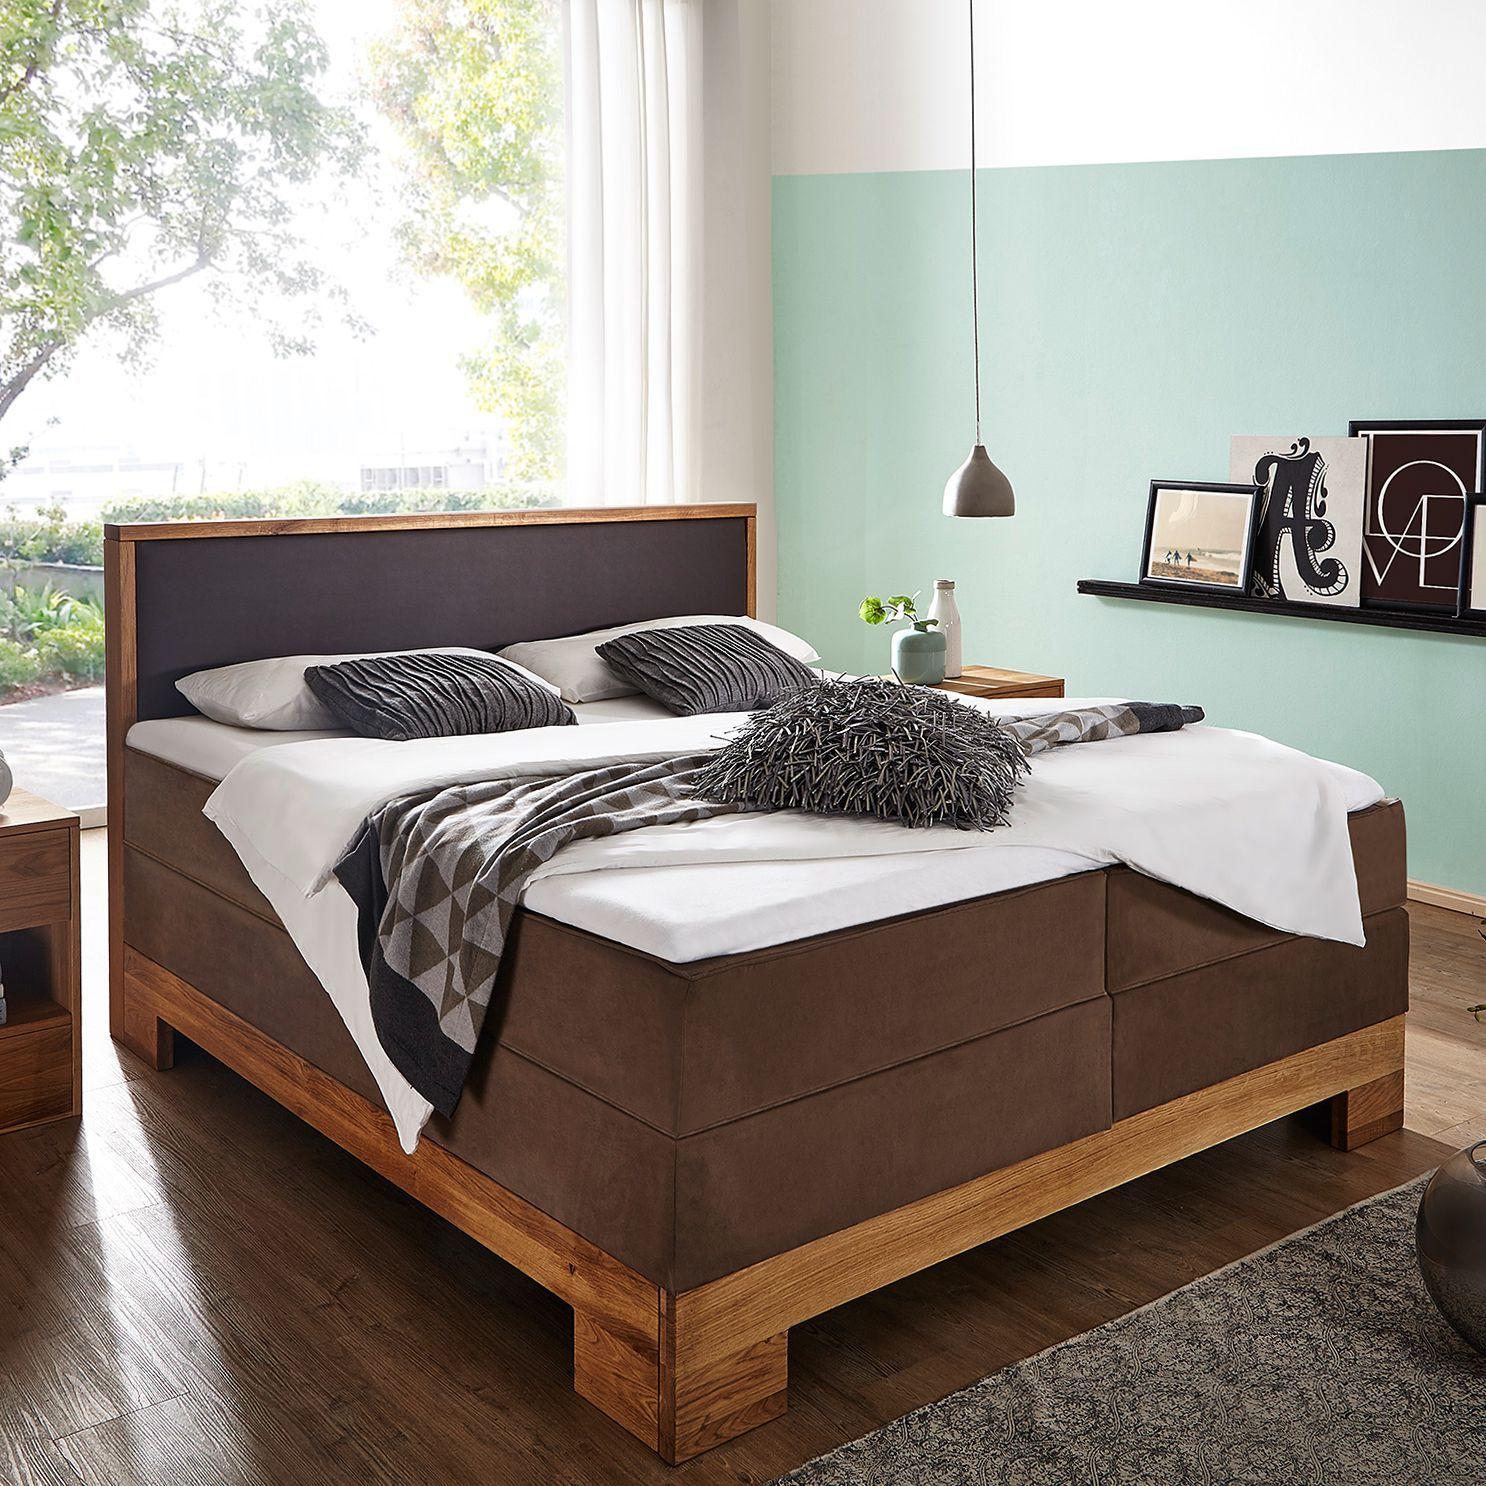 Weisses Bett 200x200 Bett Mit Bettkasten 180x200 Holz Weisses